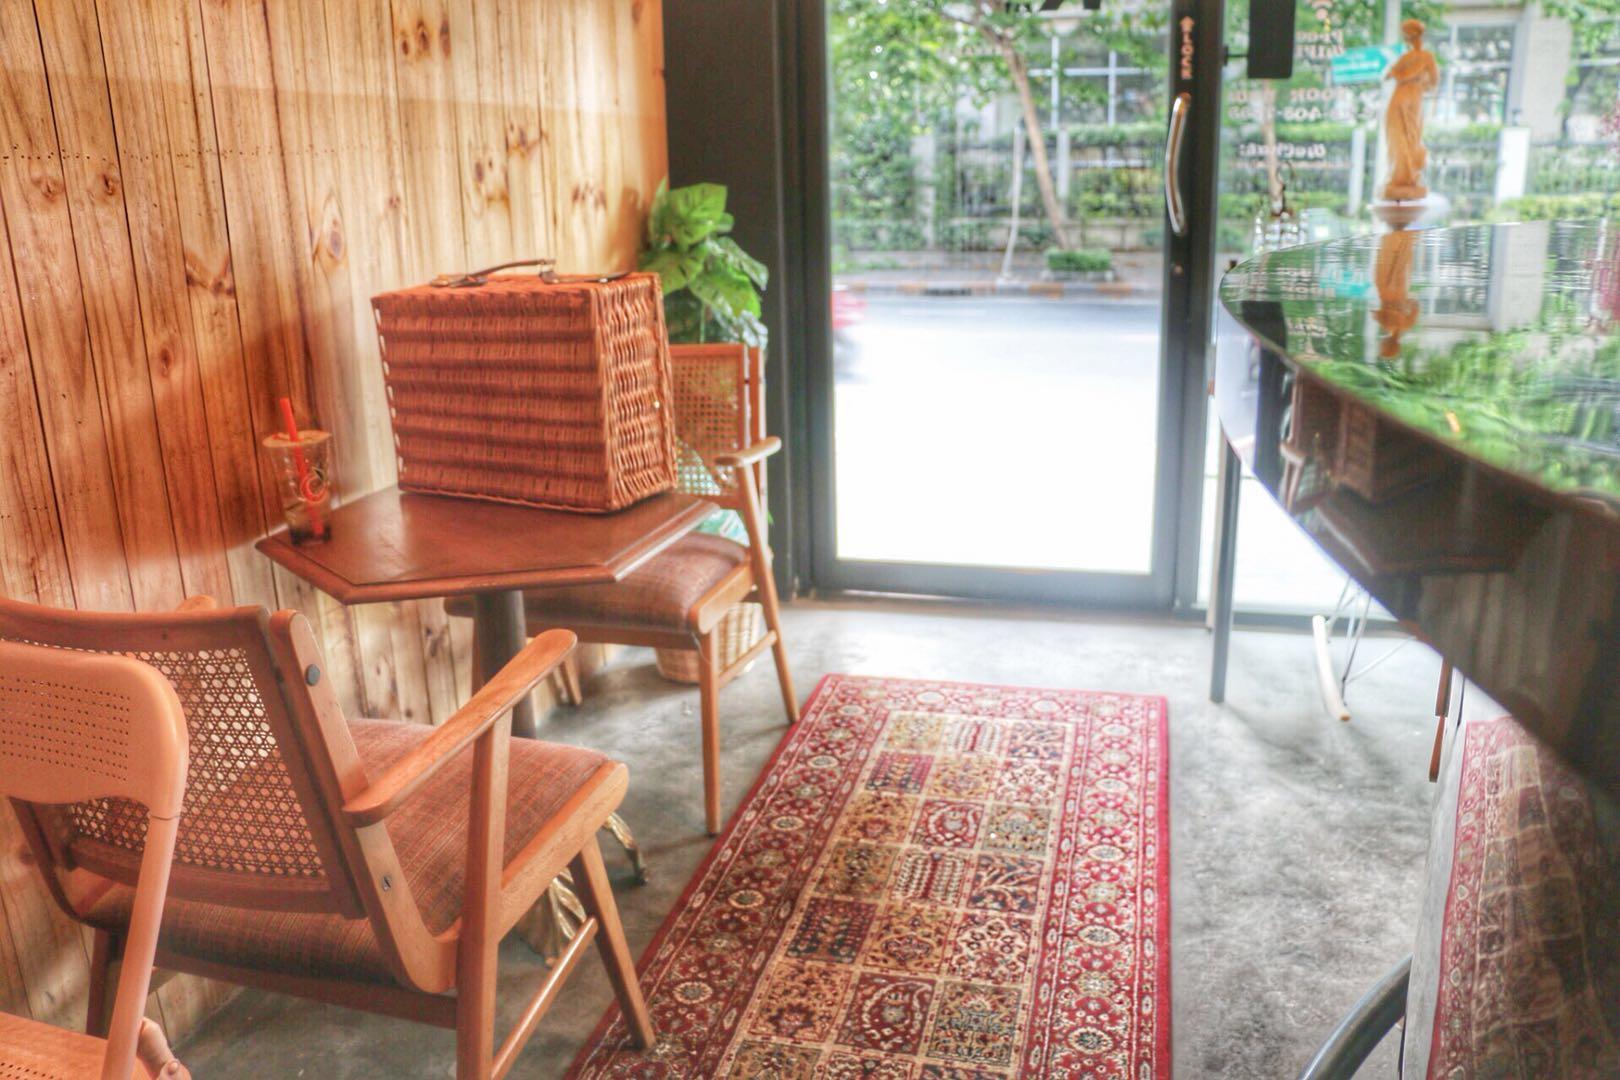 Hotels Review: Rest @ Ekkamai – Pictures, Room Rates & Deals